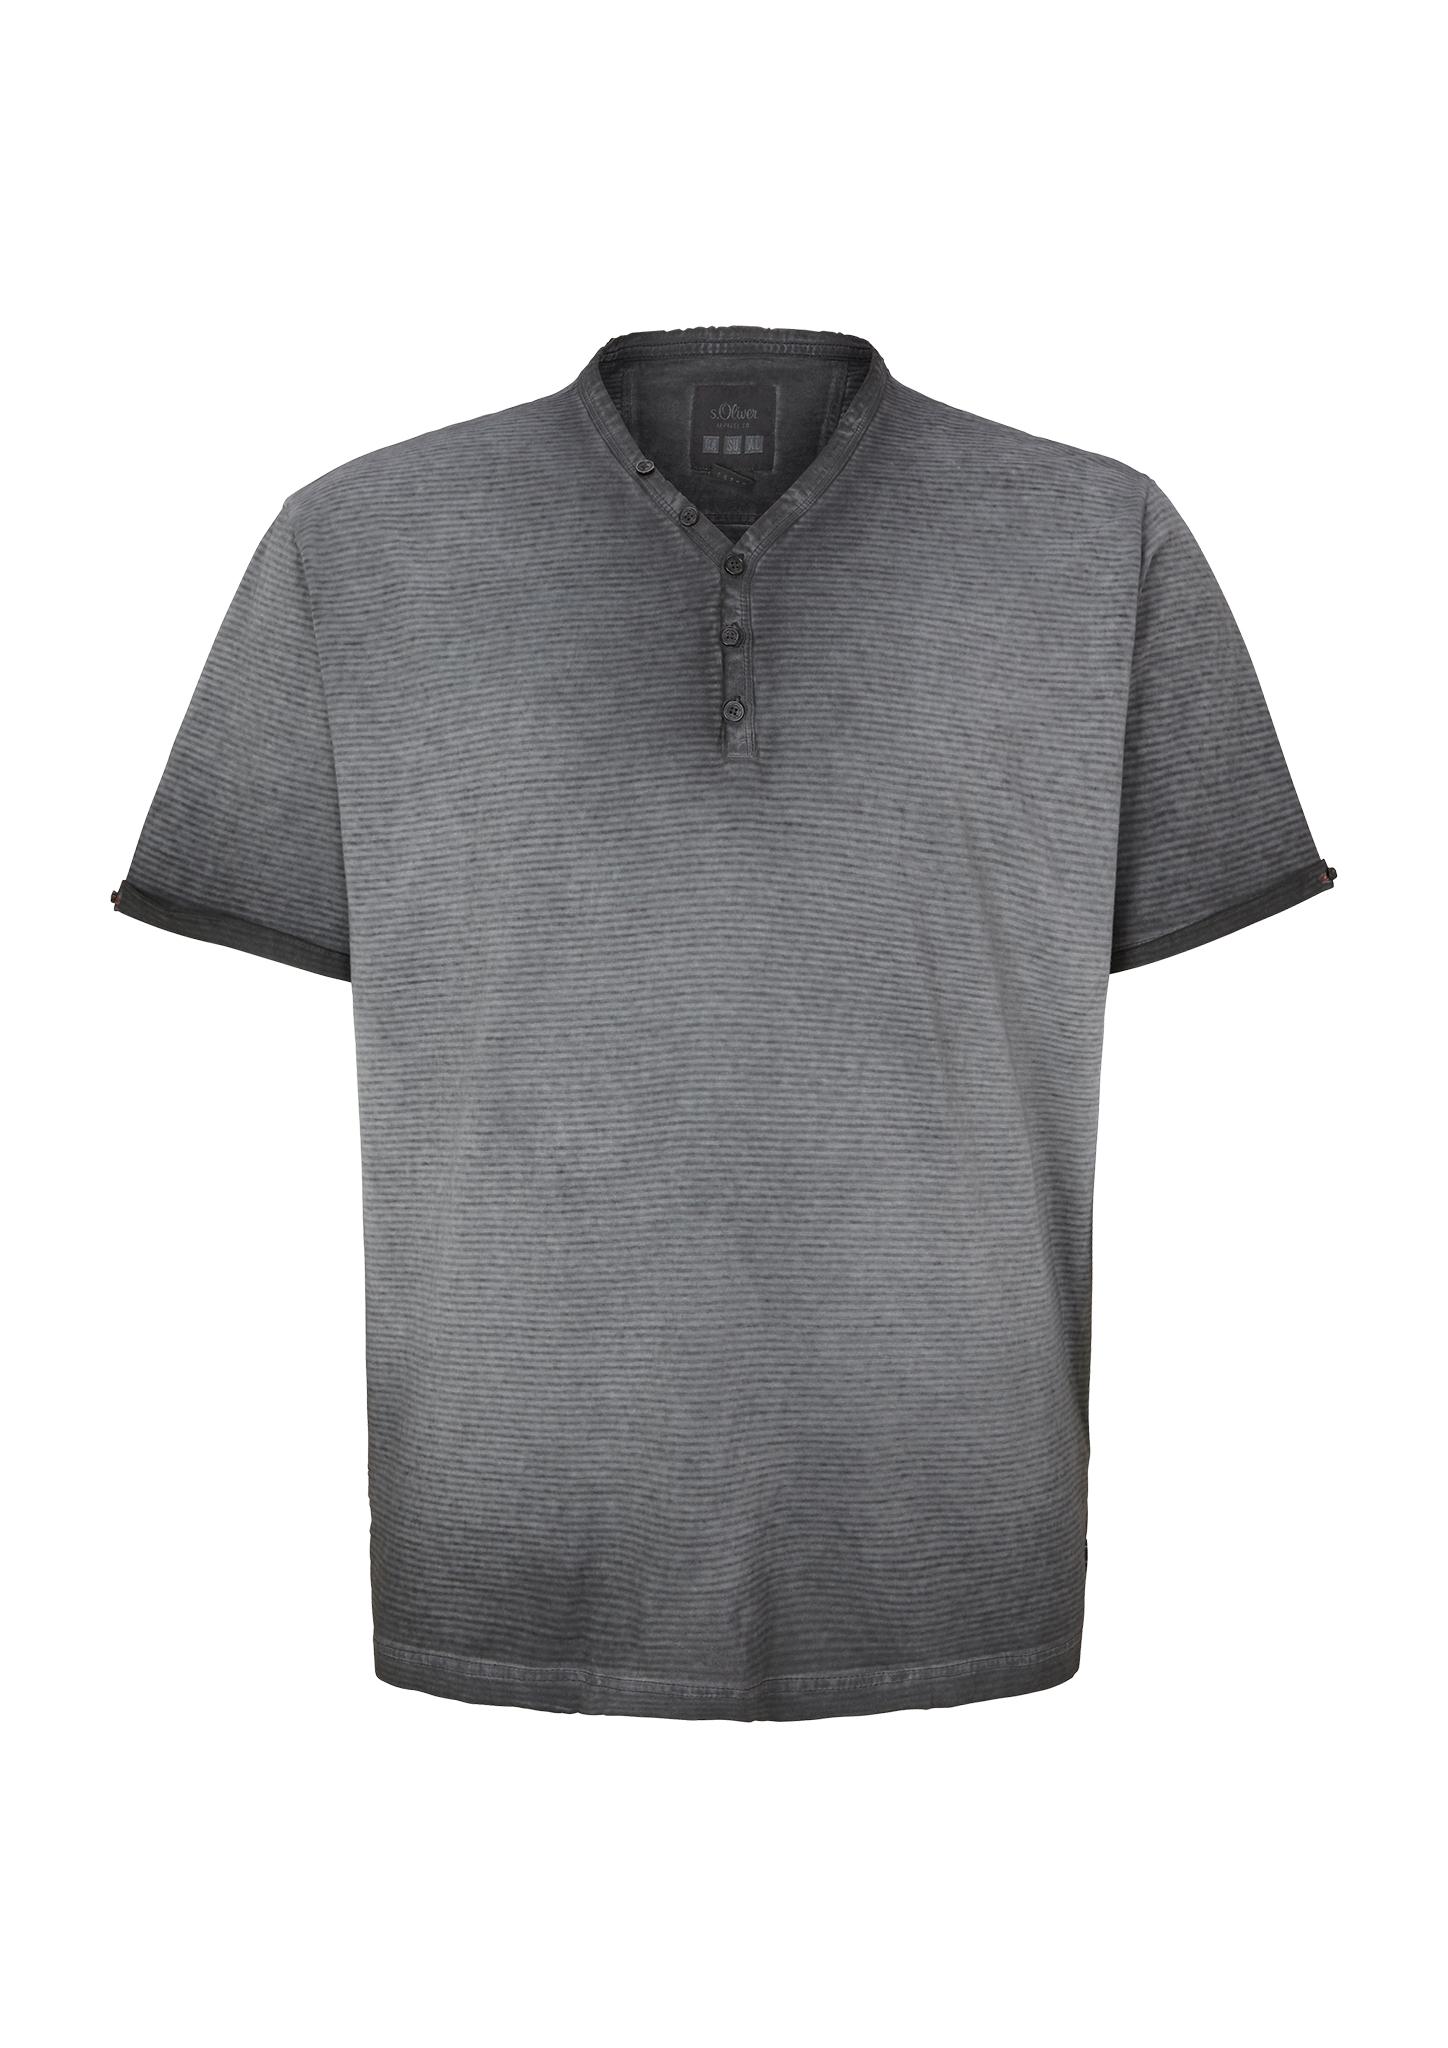 T-Shirt | Bekleidung > Shirts > Sonstige Shirts | s.Oliver Men Big Sizes